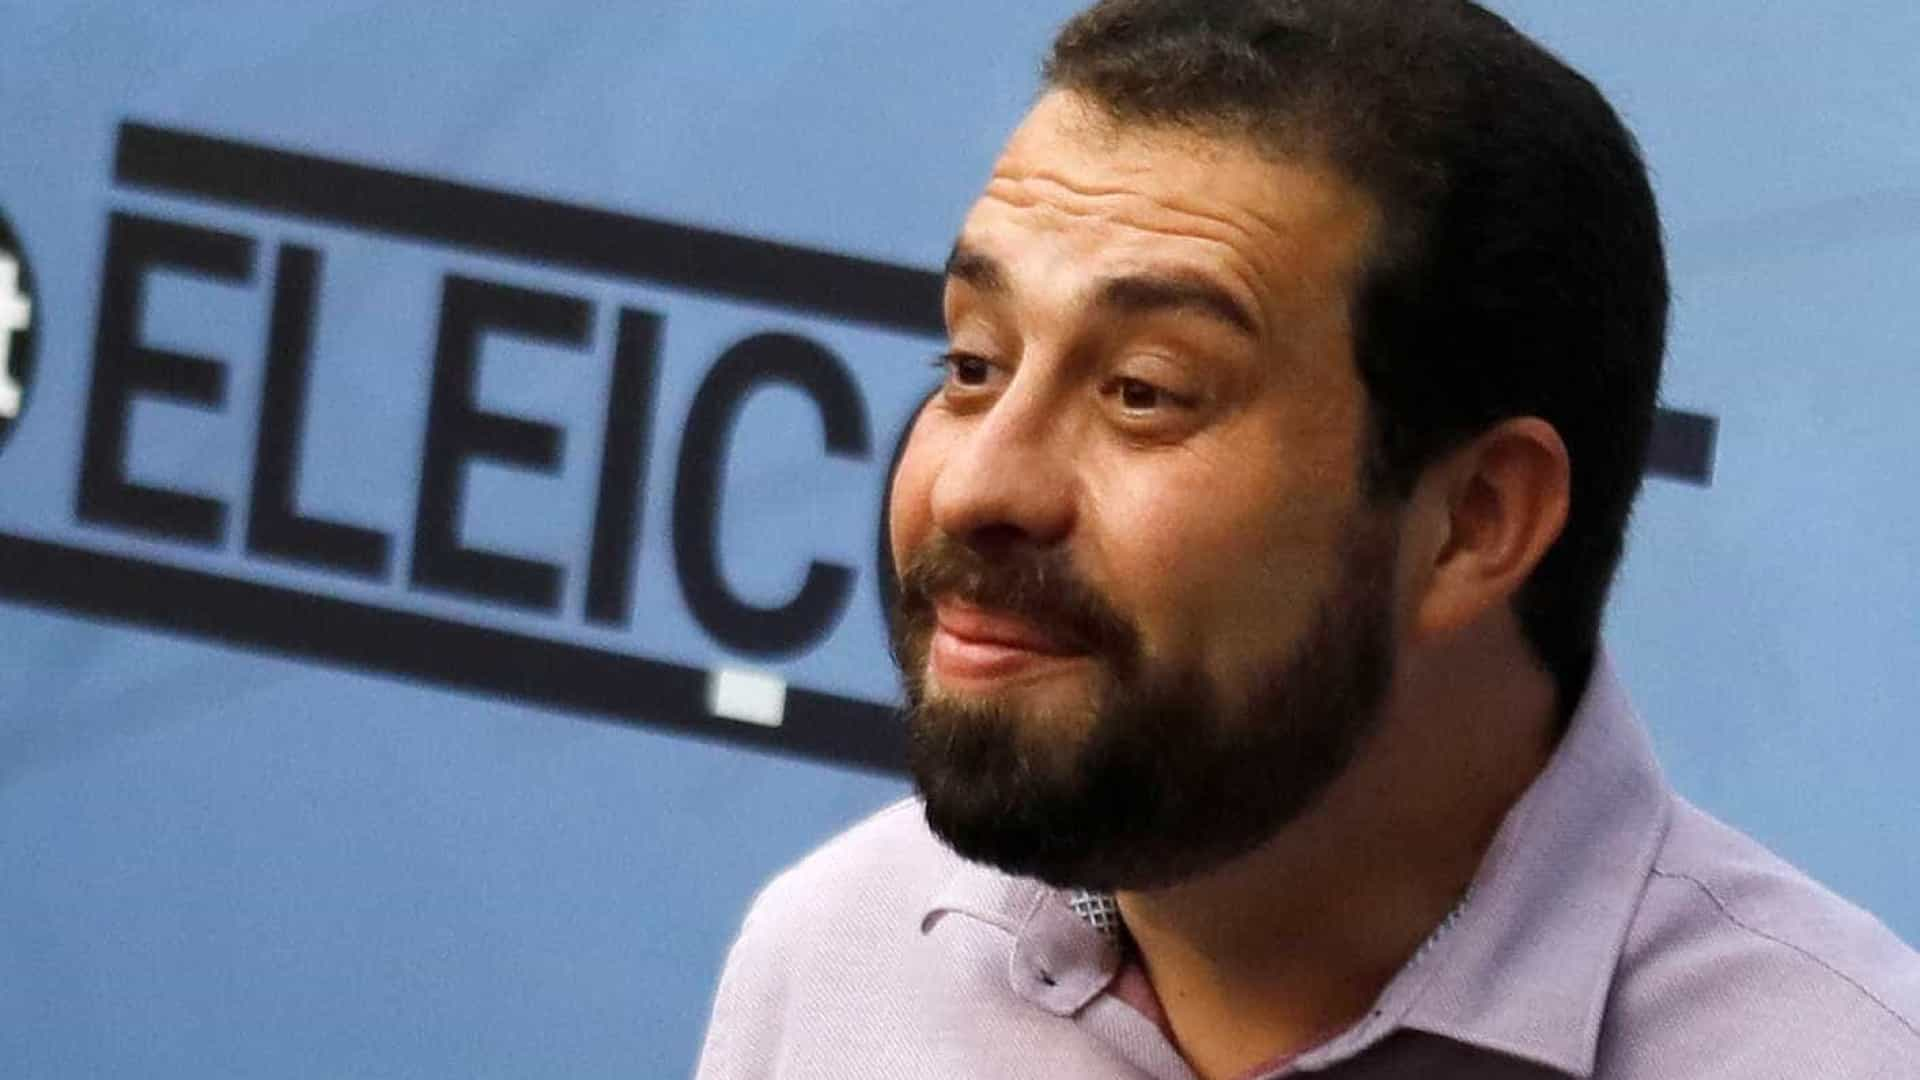 Guilherme Boulos testa positivo para covid-19